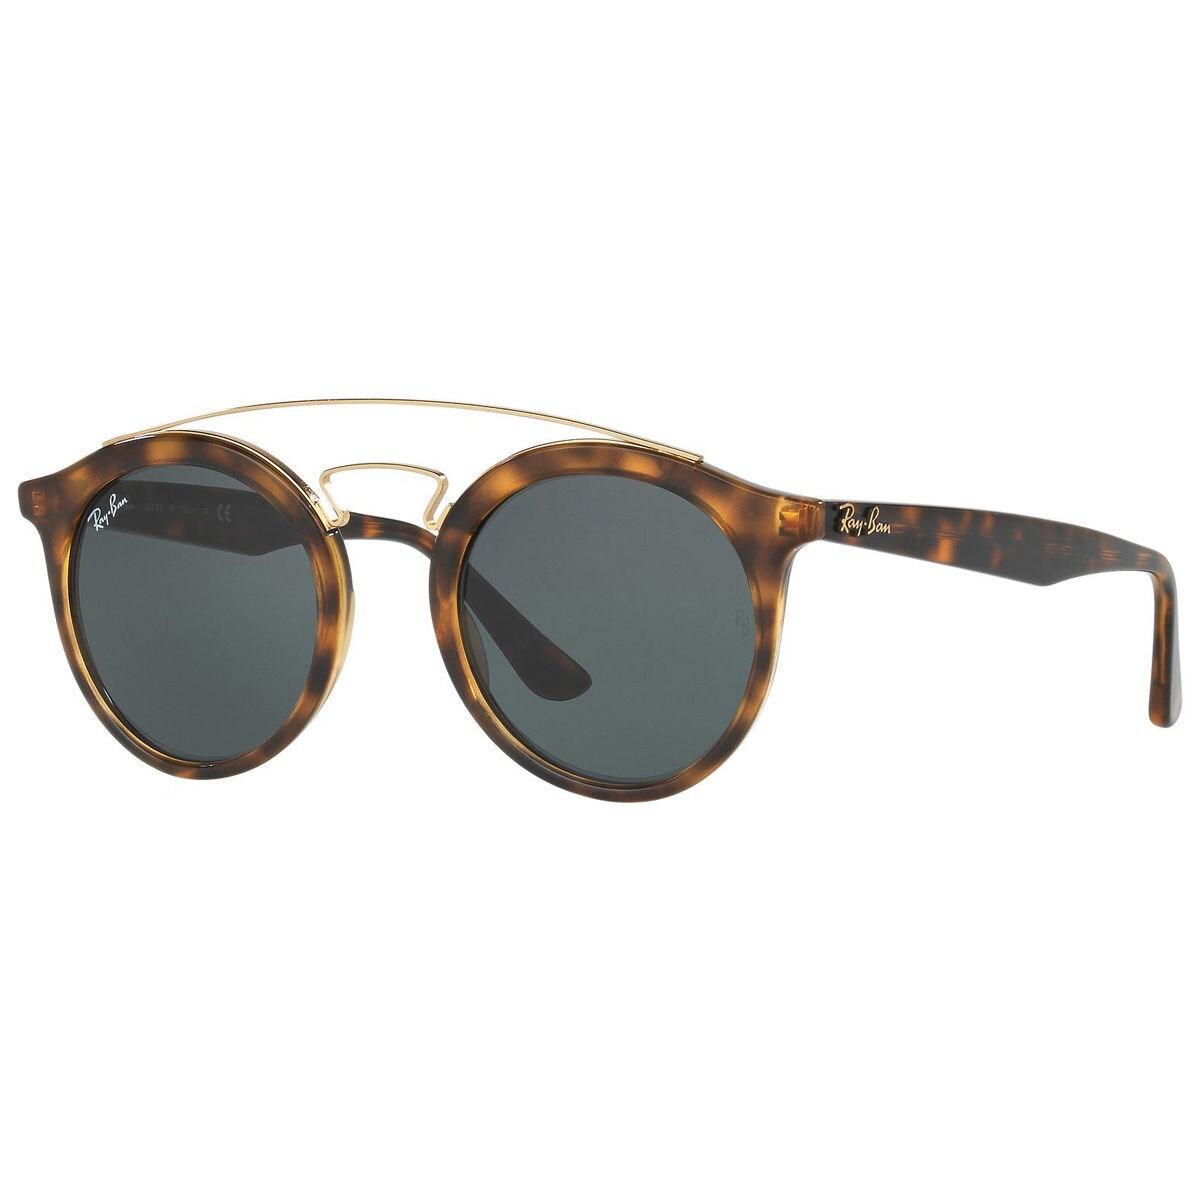 9e0cadbba76 Ray-Ban Gatsby I RB4256 710 71 Unisex Tortoise Frame Green Classic Lens  Sunglasses